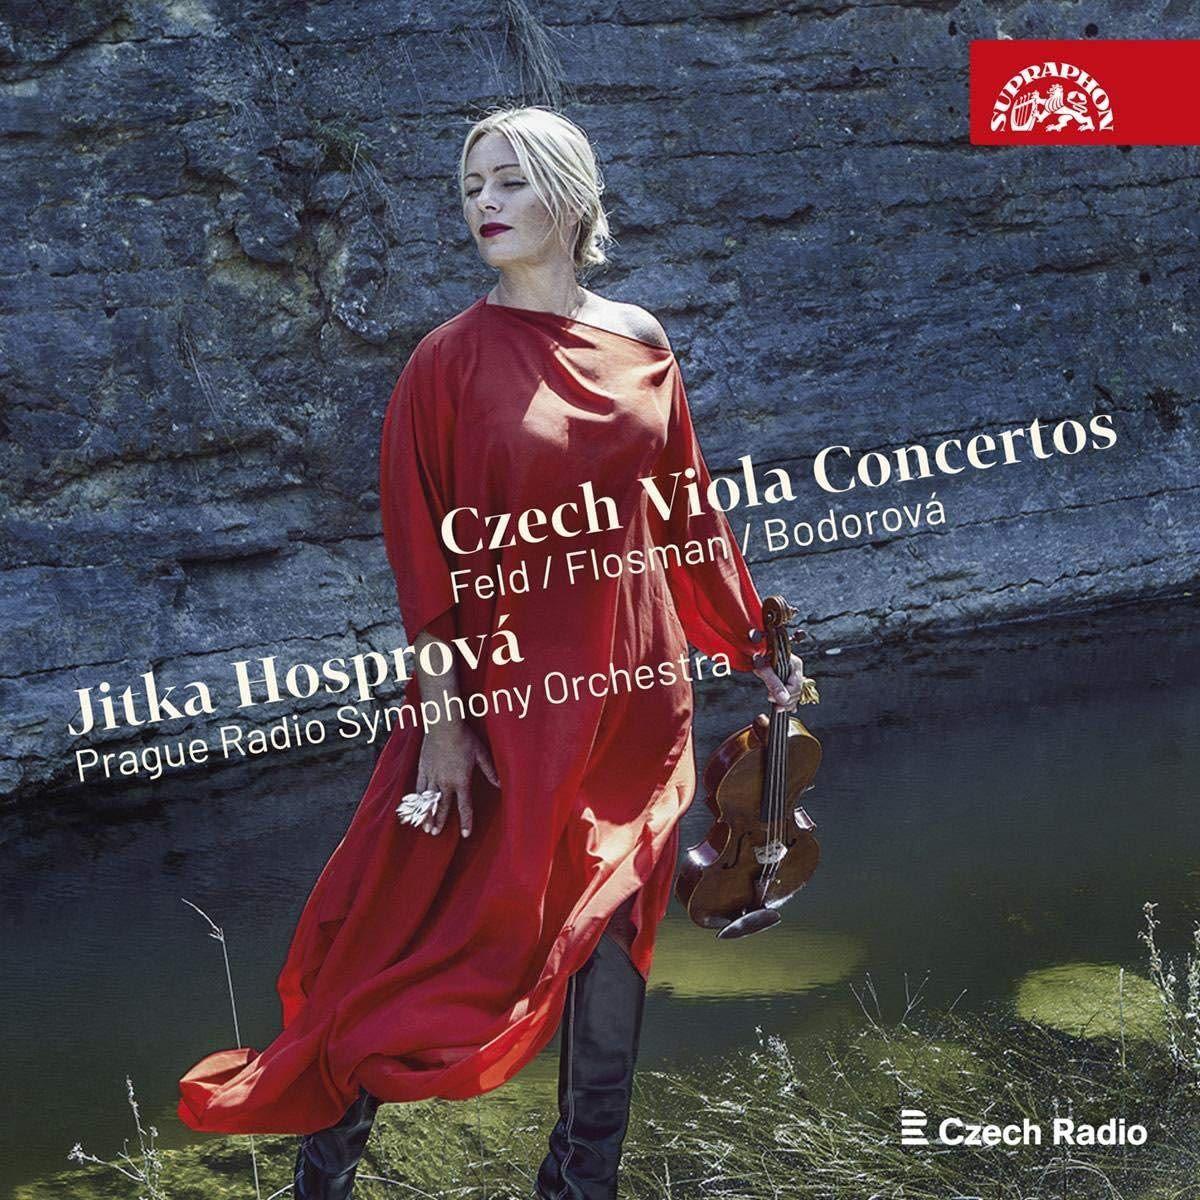 Photo No.1 of Czech Viola Concertos - Music by Feld, Flosman; Bodorova